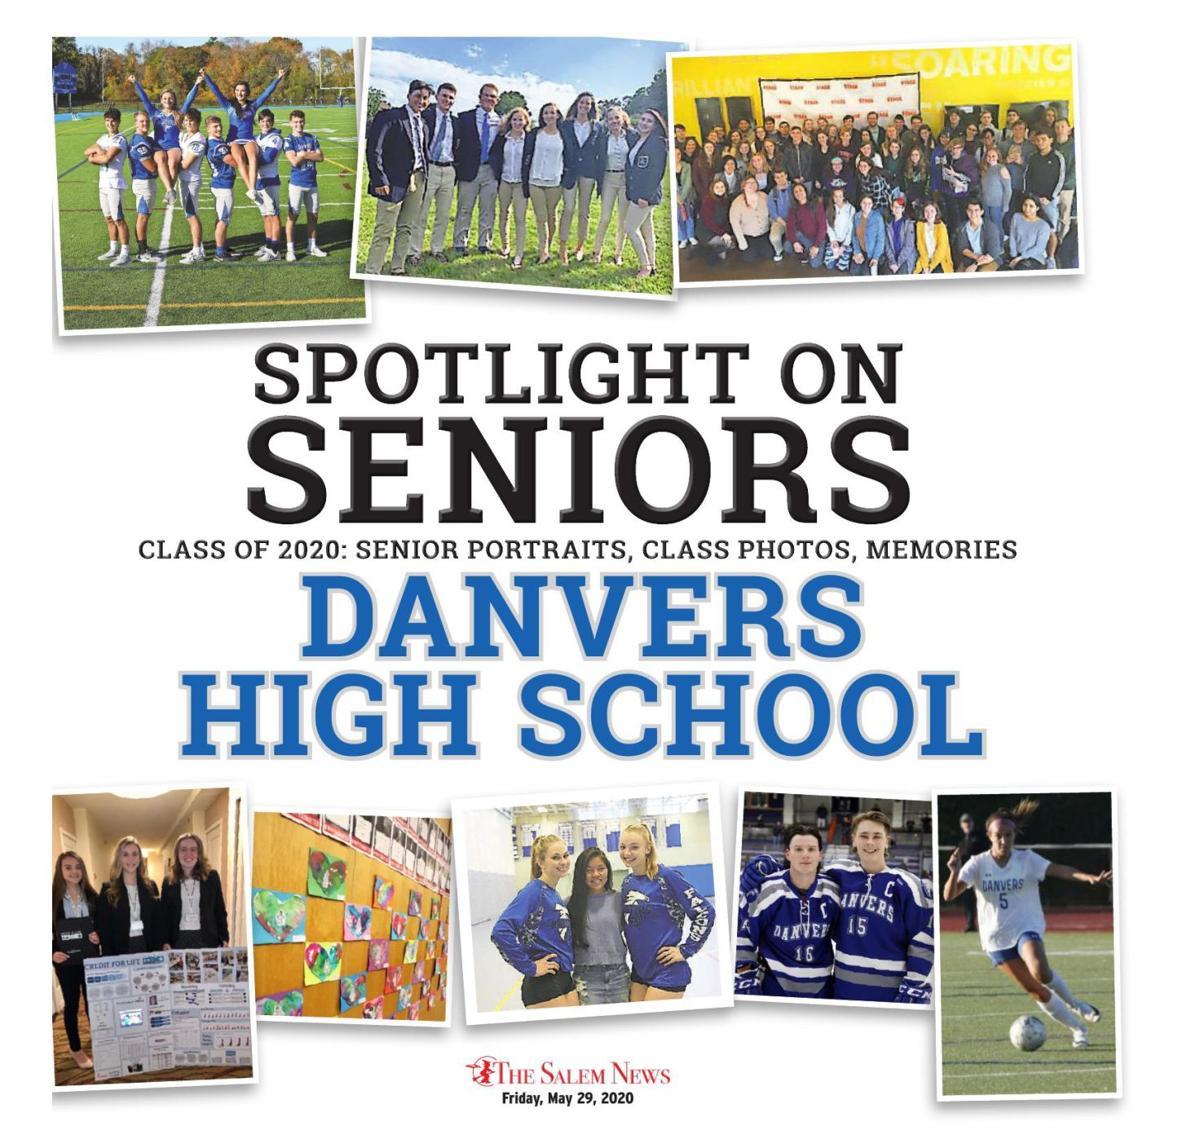 Spotlight on Seniors: Danvers High School